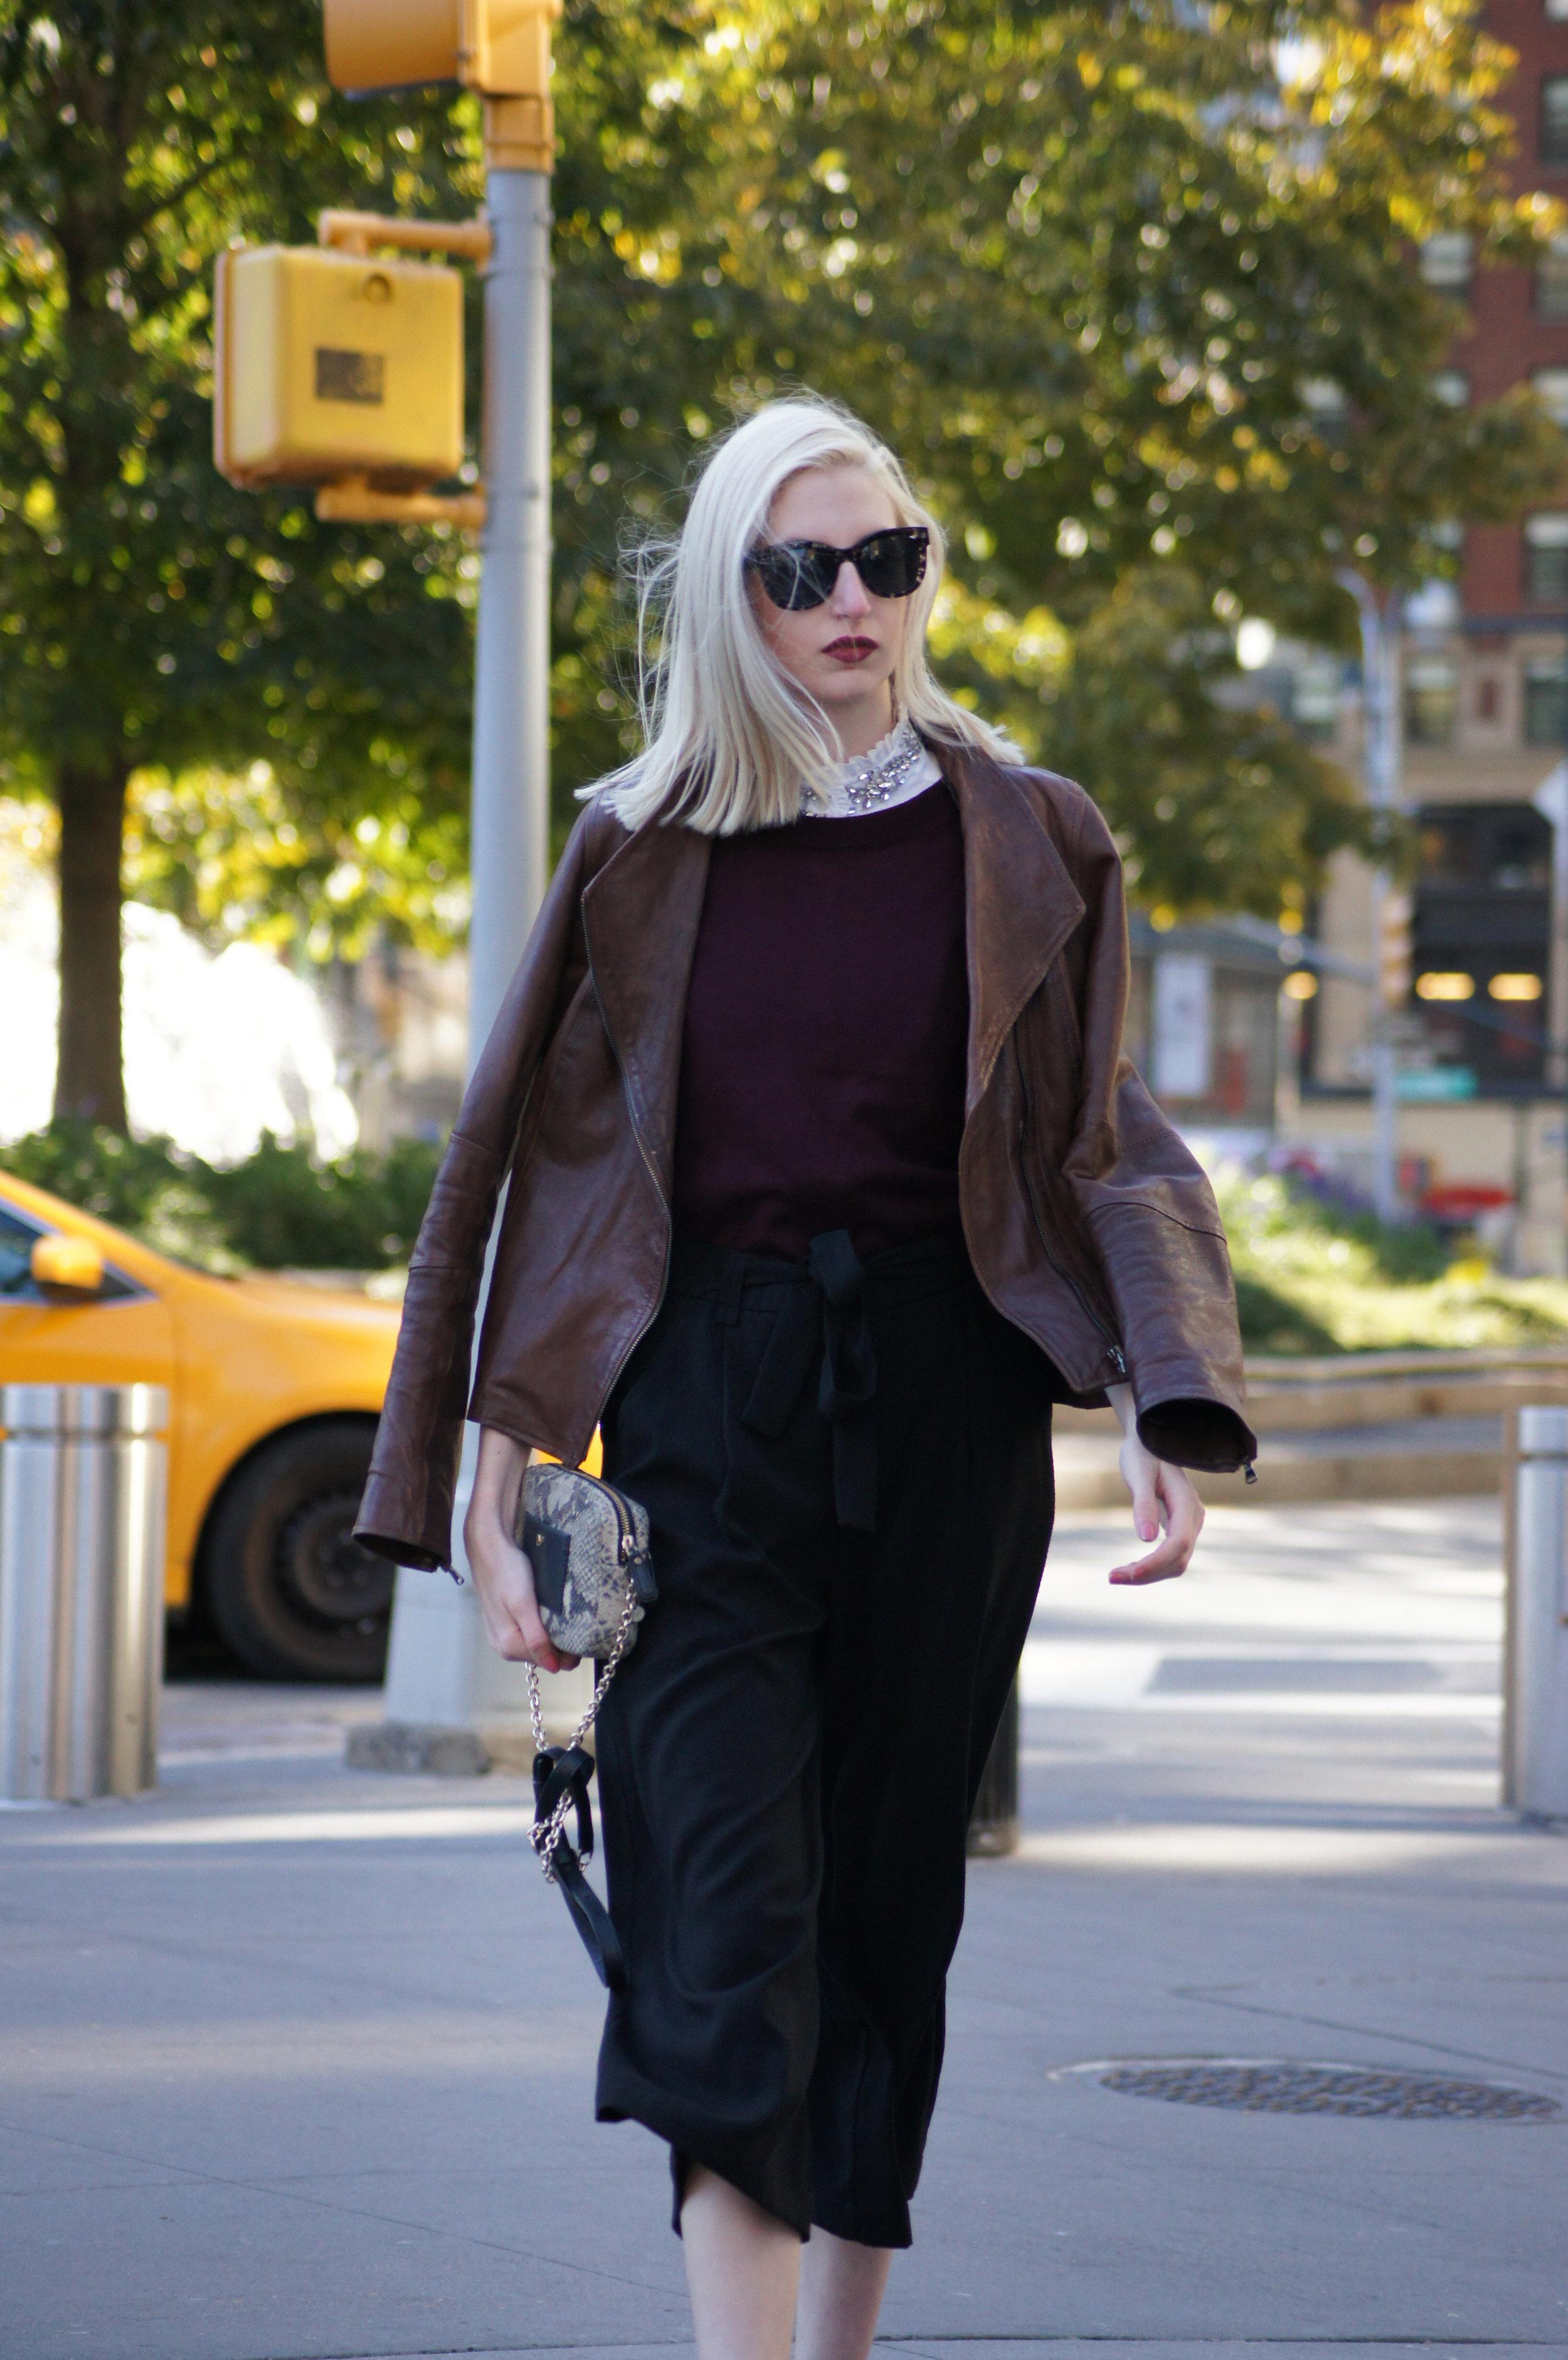 J.Crew embellished ruffle collar shirt, J.Crew burgundy Tippi sweater, Zara black high waist culottes, black block heel ankle boots